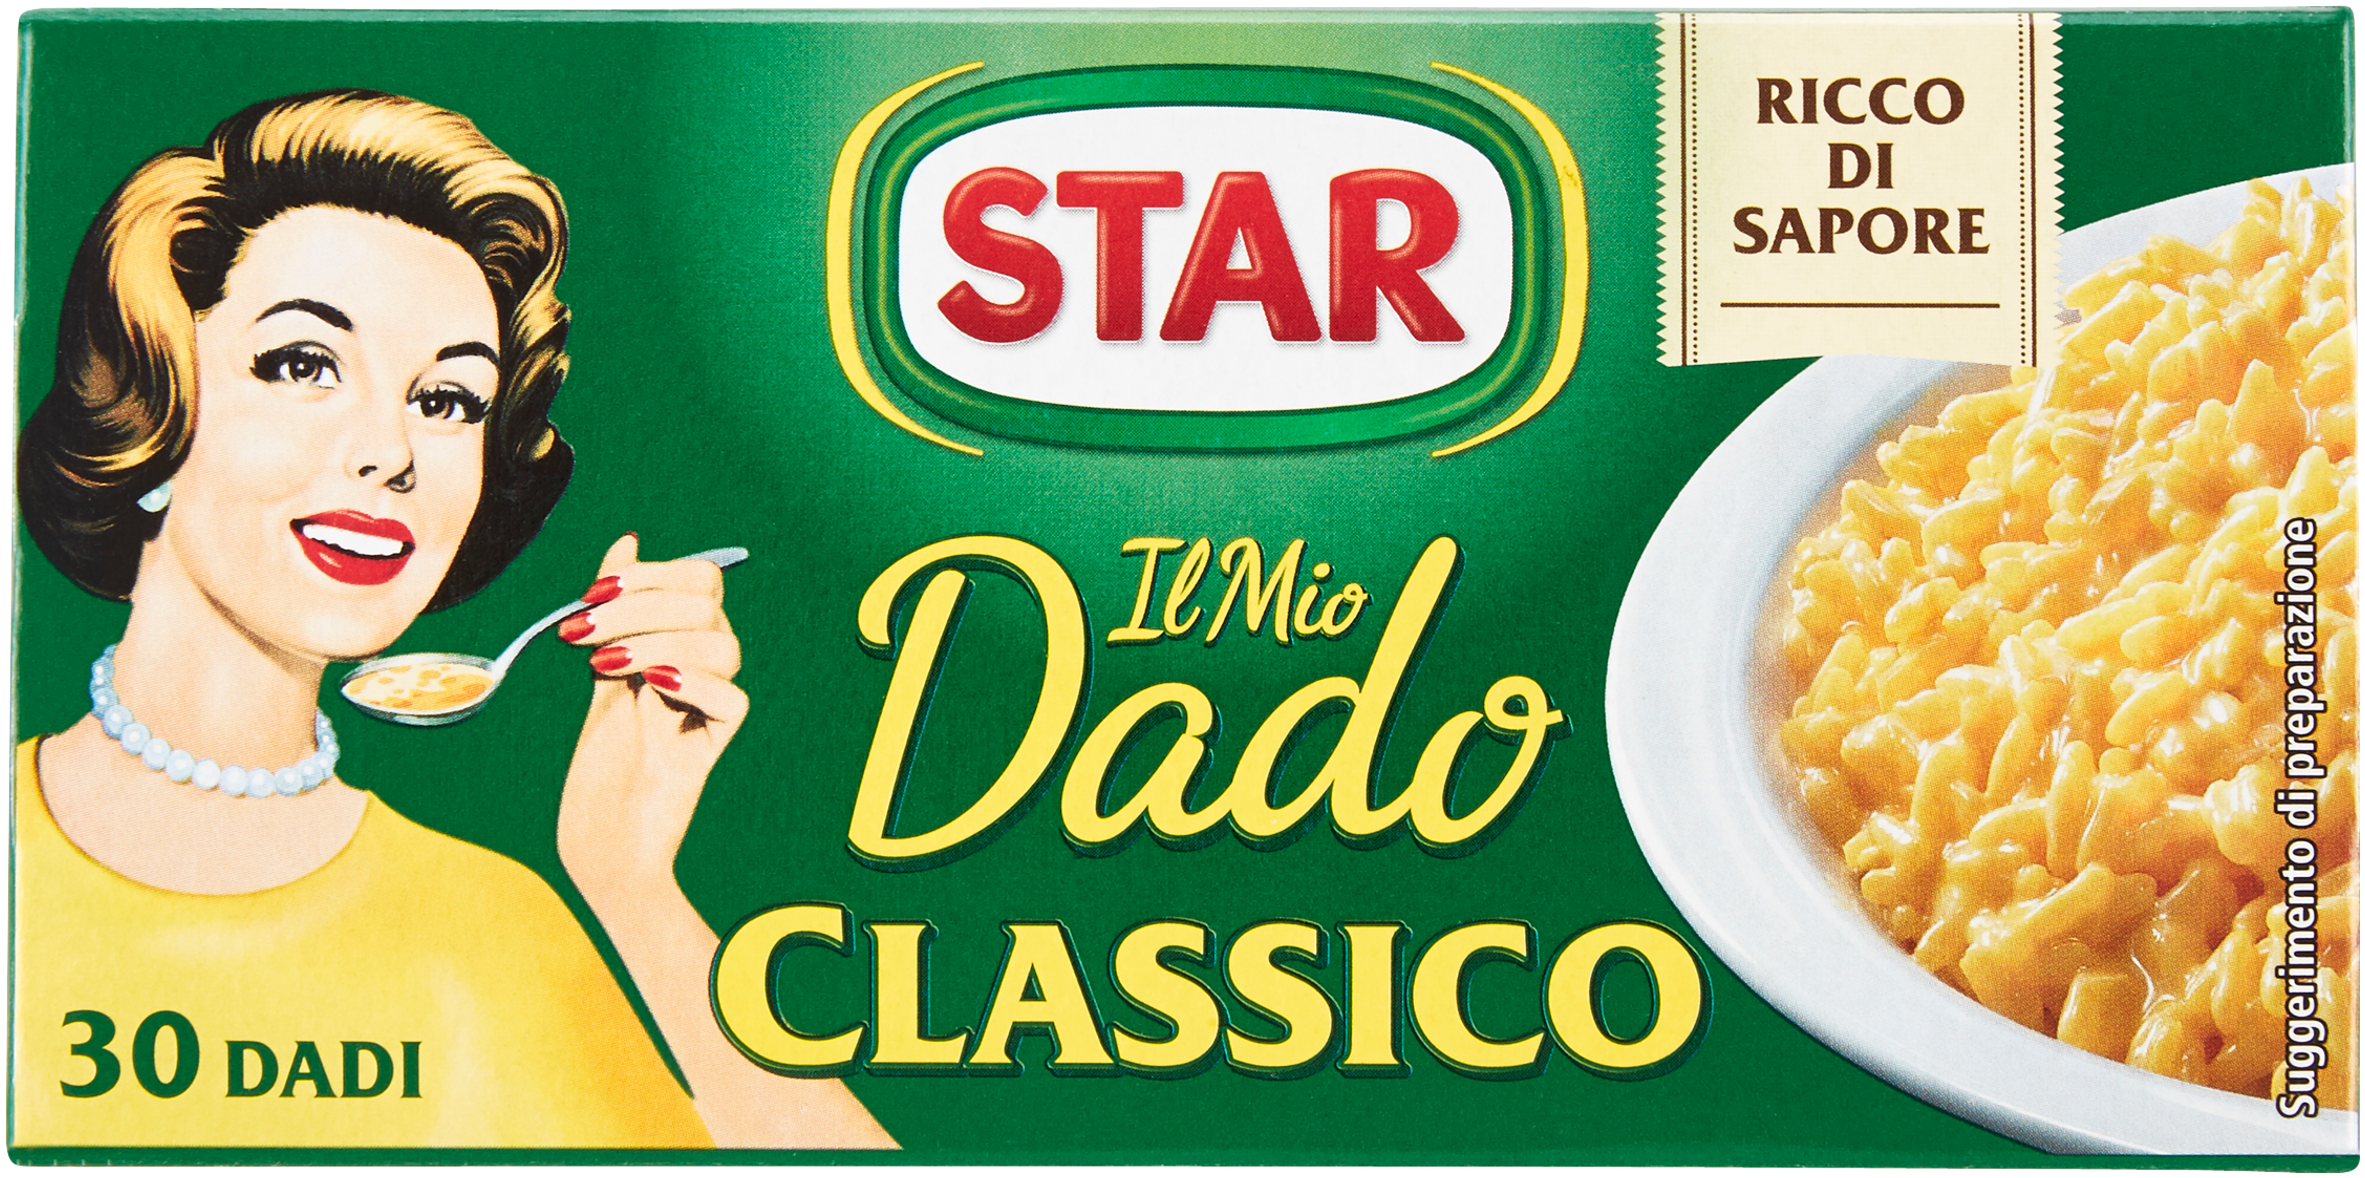 DADI STAR 30 CUBI